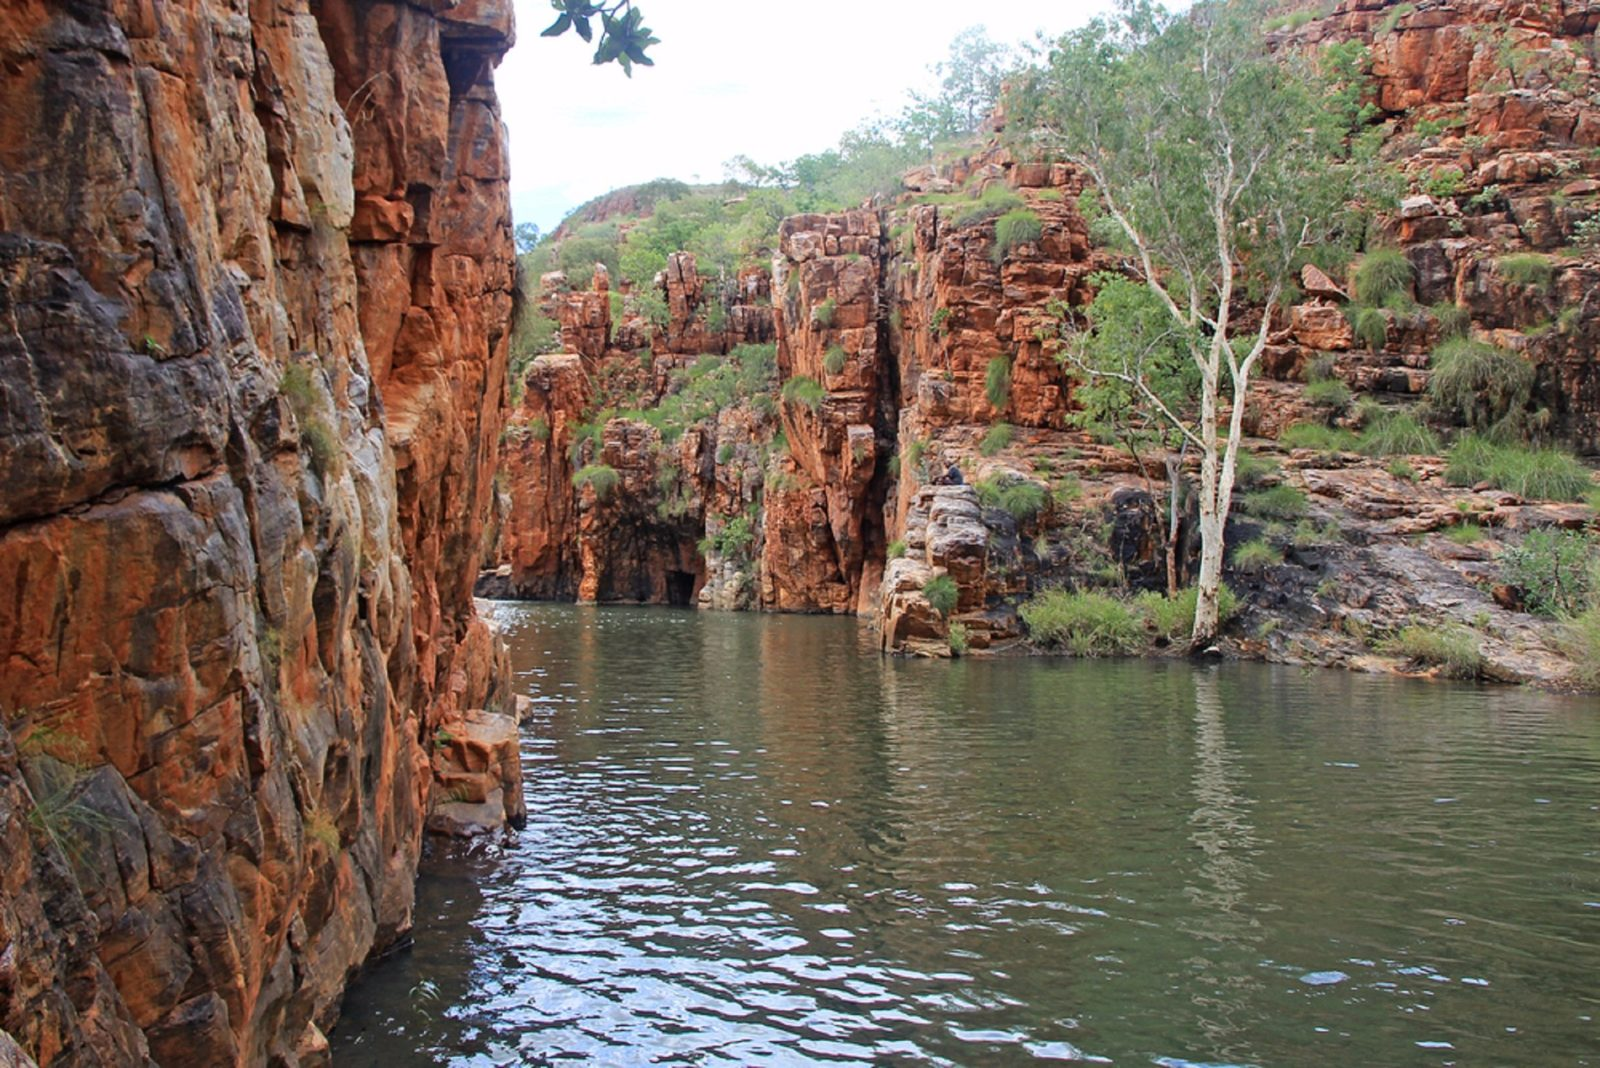 Luridjii Tours Junama Four Wheel Drive Tagalong Tours, Western Australia